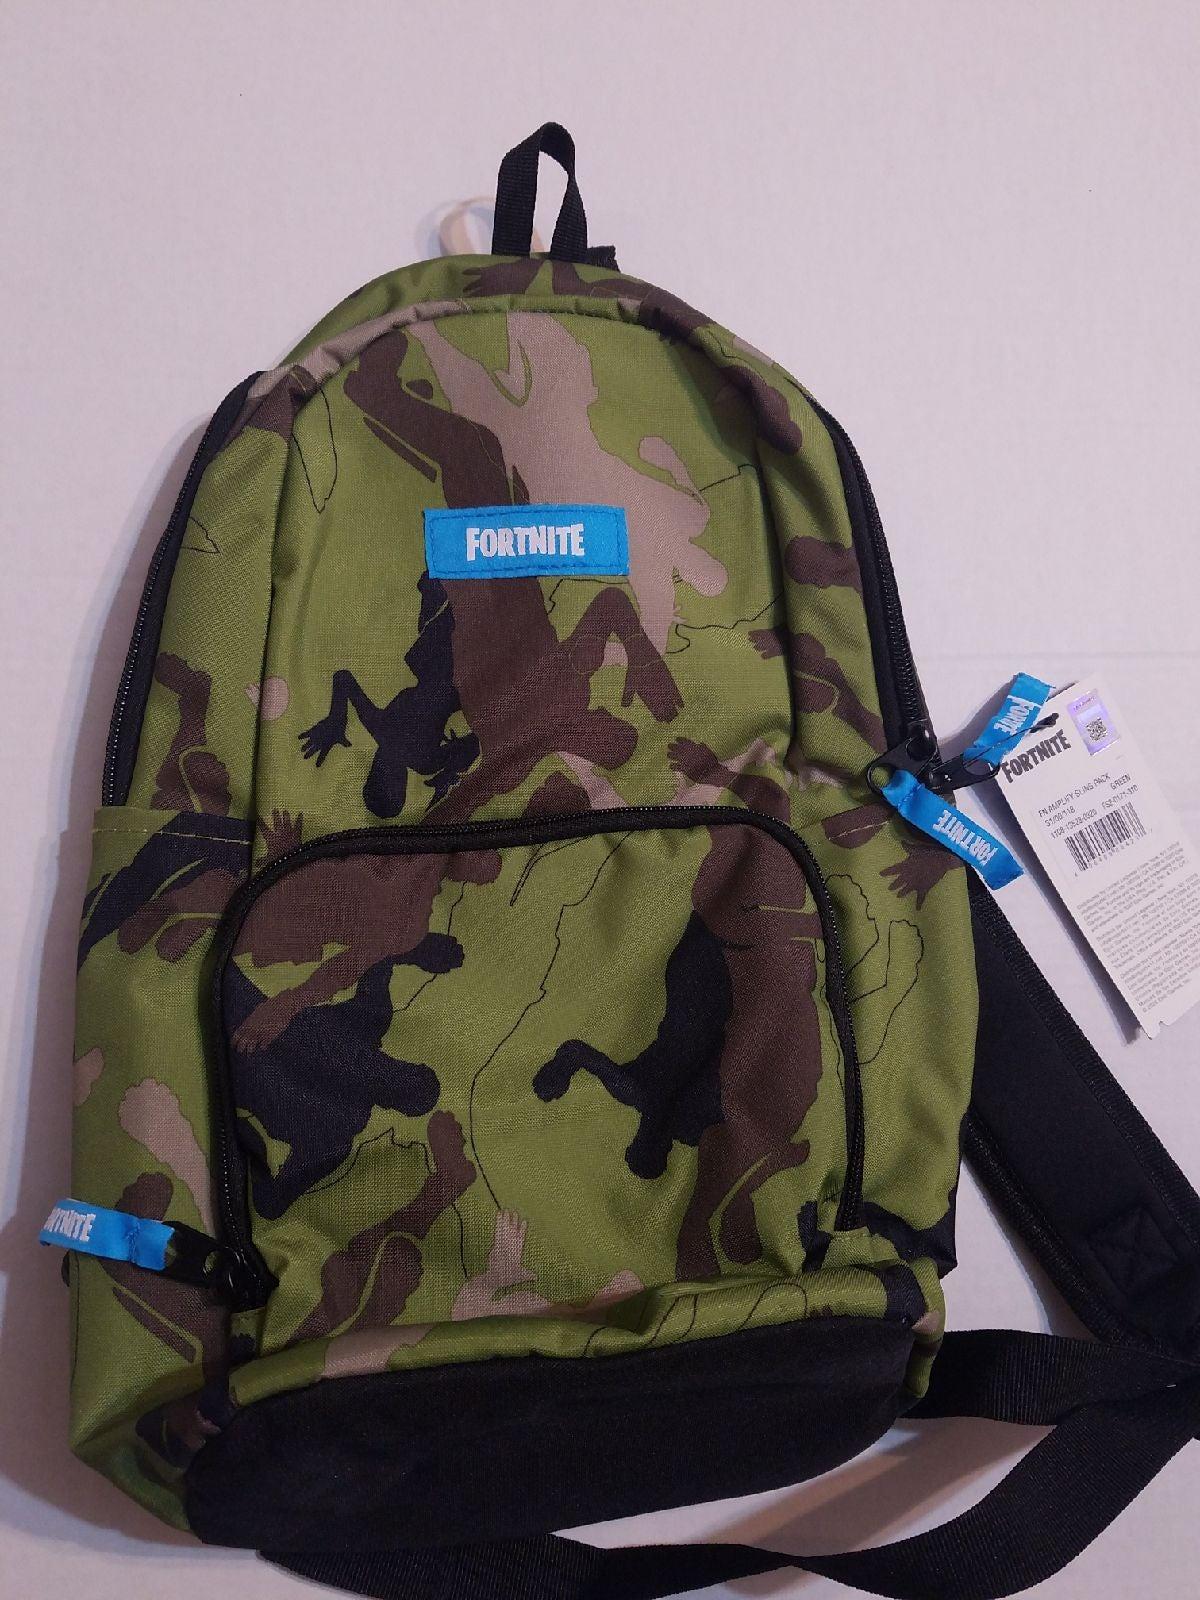 Fortnite Amplify Camouflage Slingpack